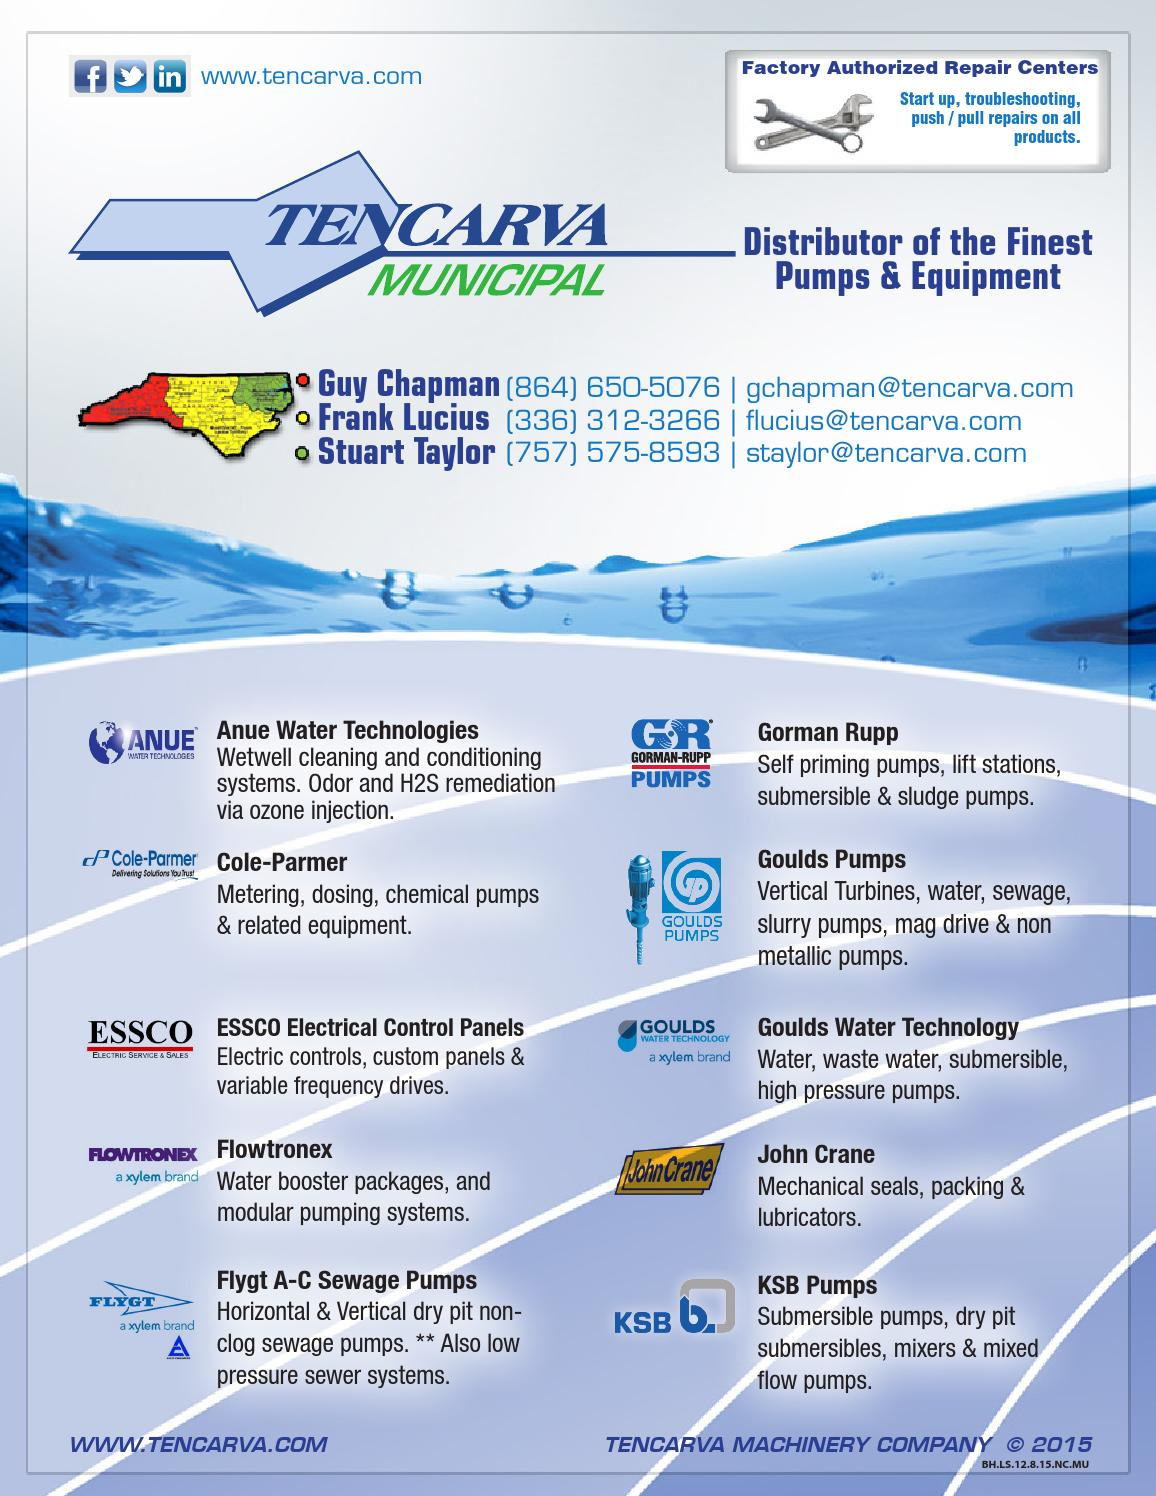 Tencarva Municipal Line Card - North Carolina by Tencarva